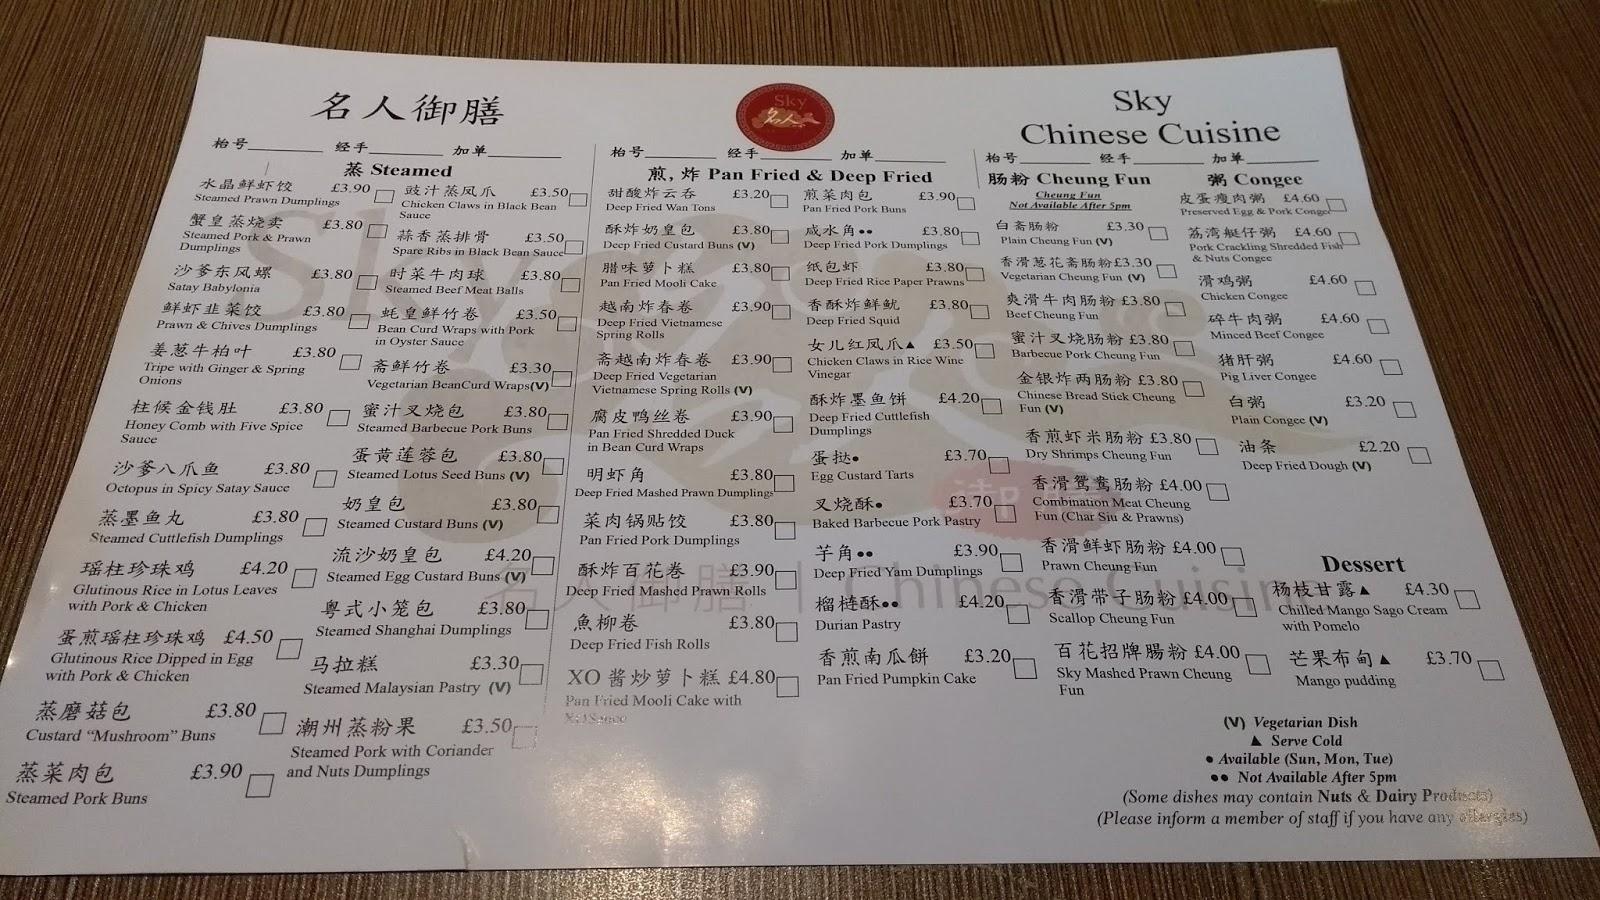 The Secret Diner: Sky Chinese Cuisine